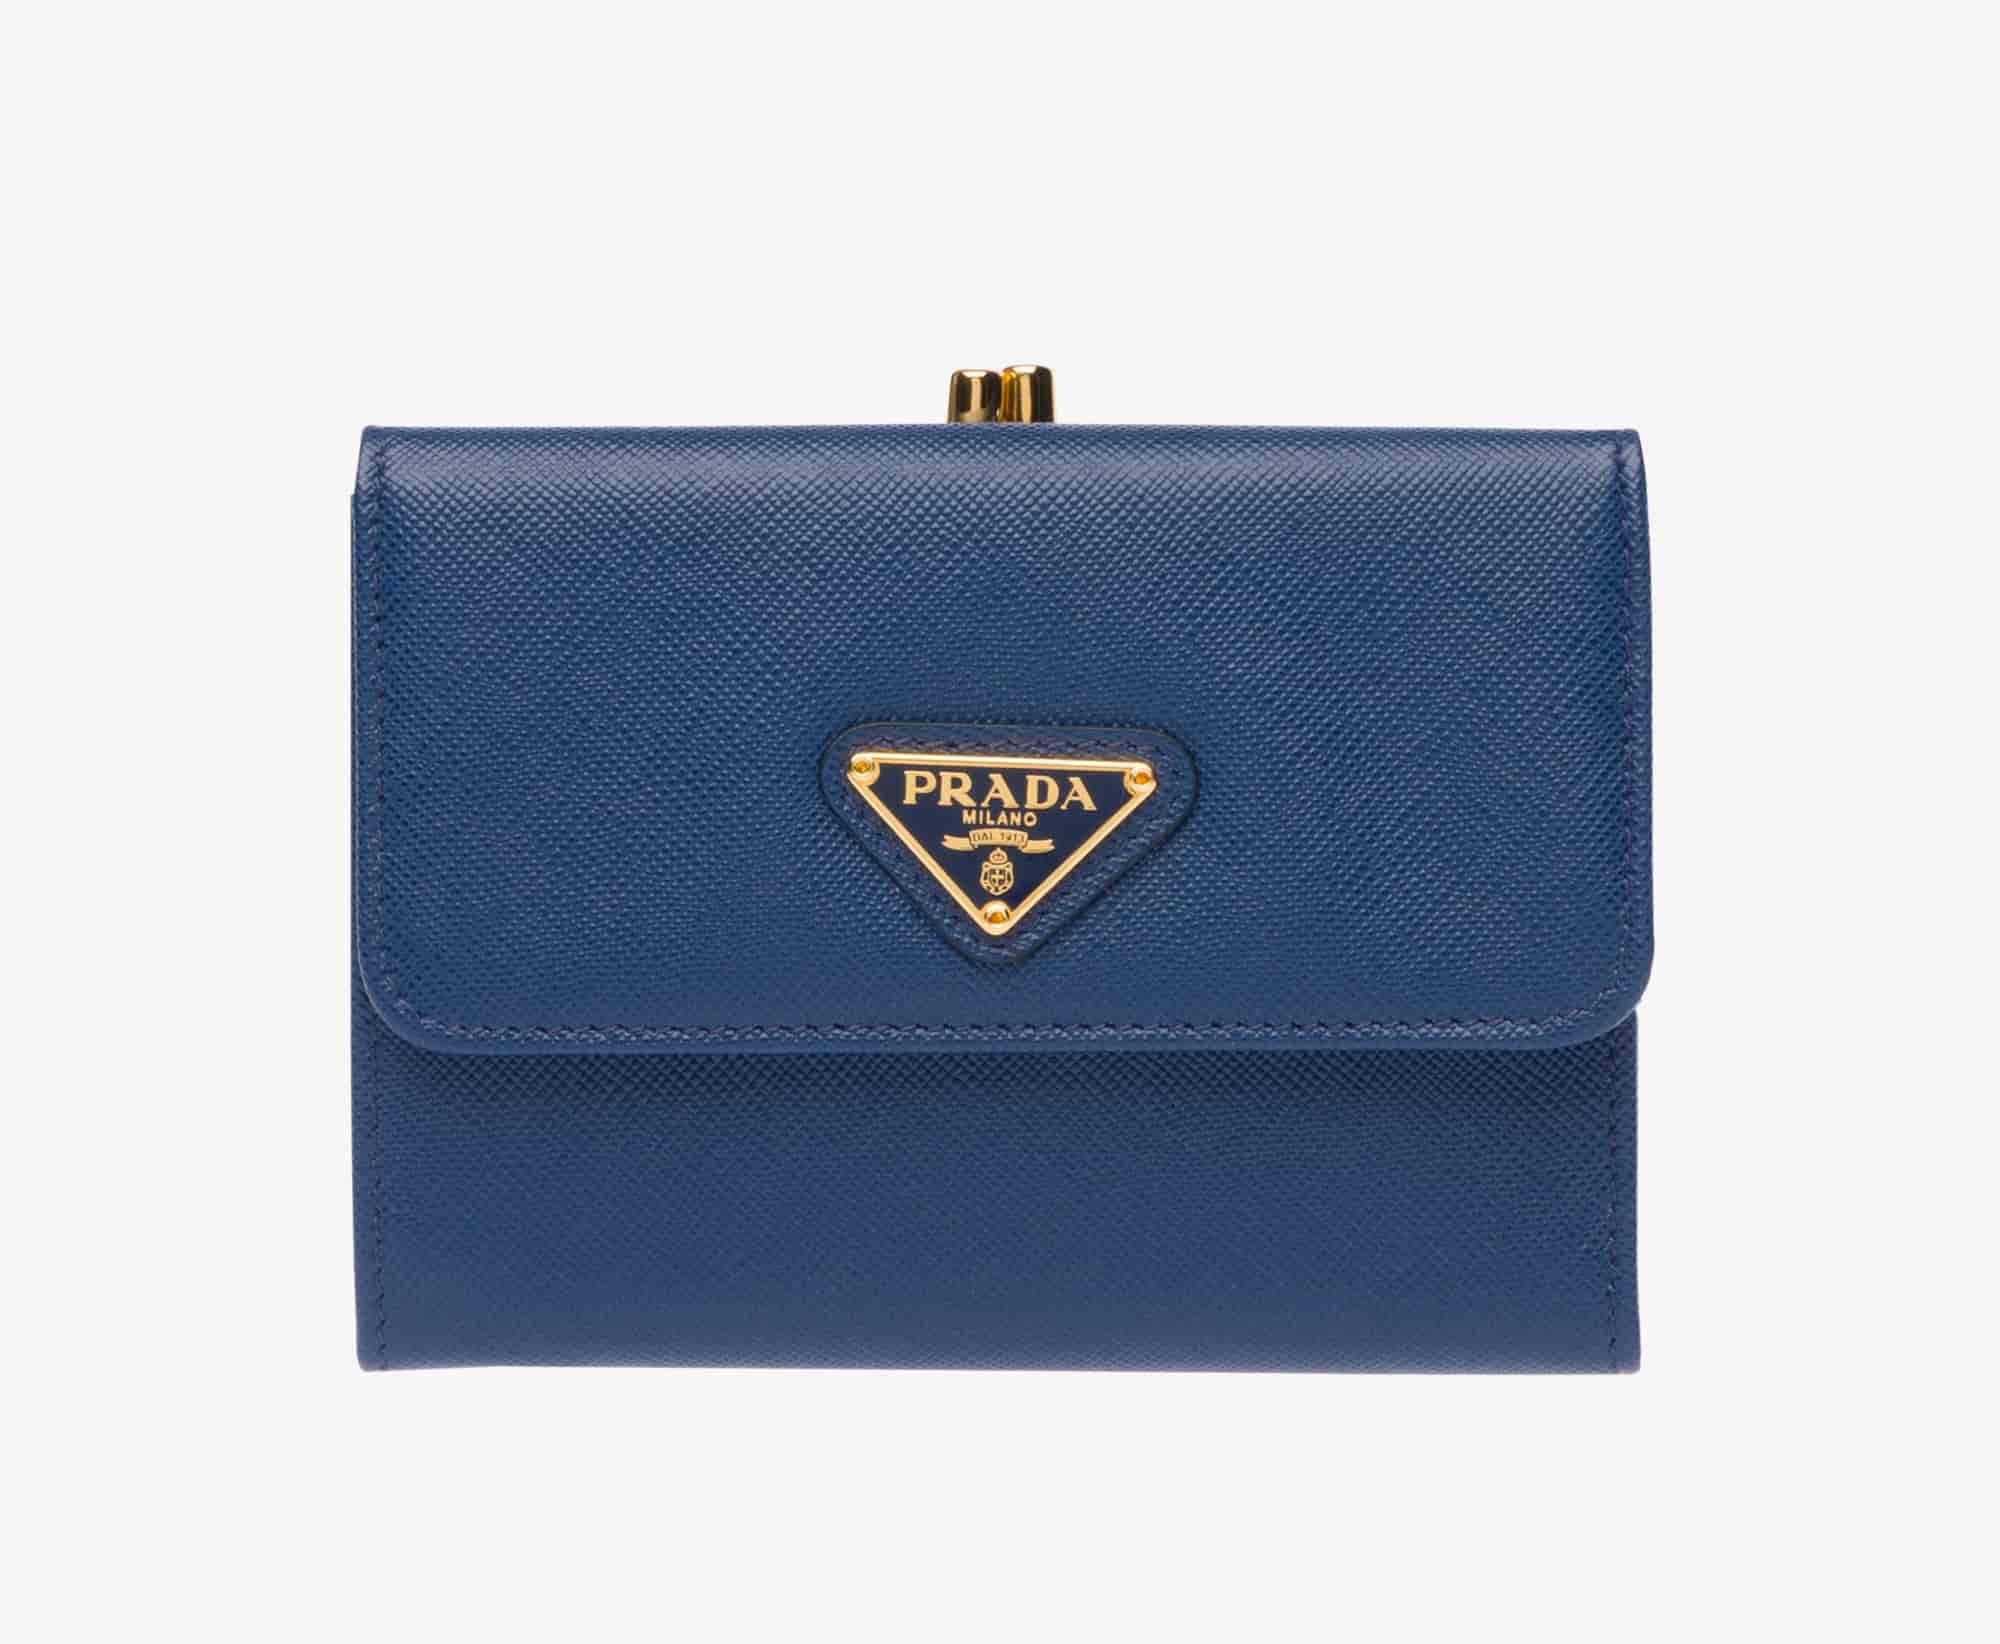 buy prada wallet